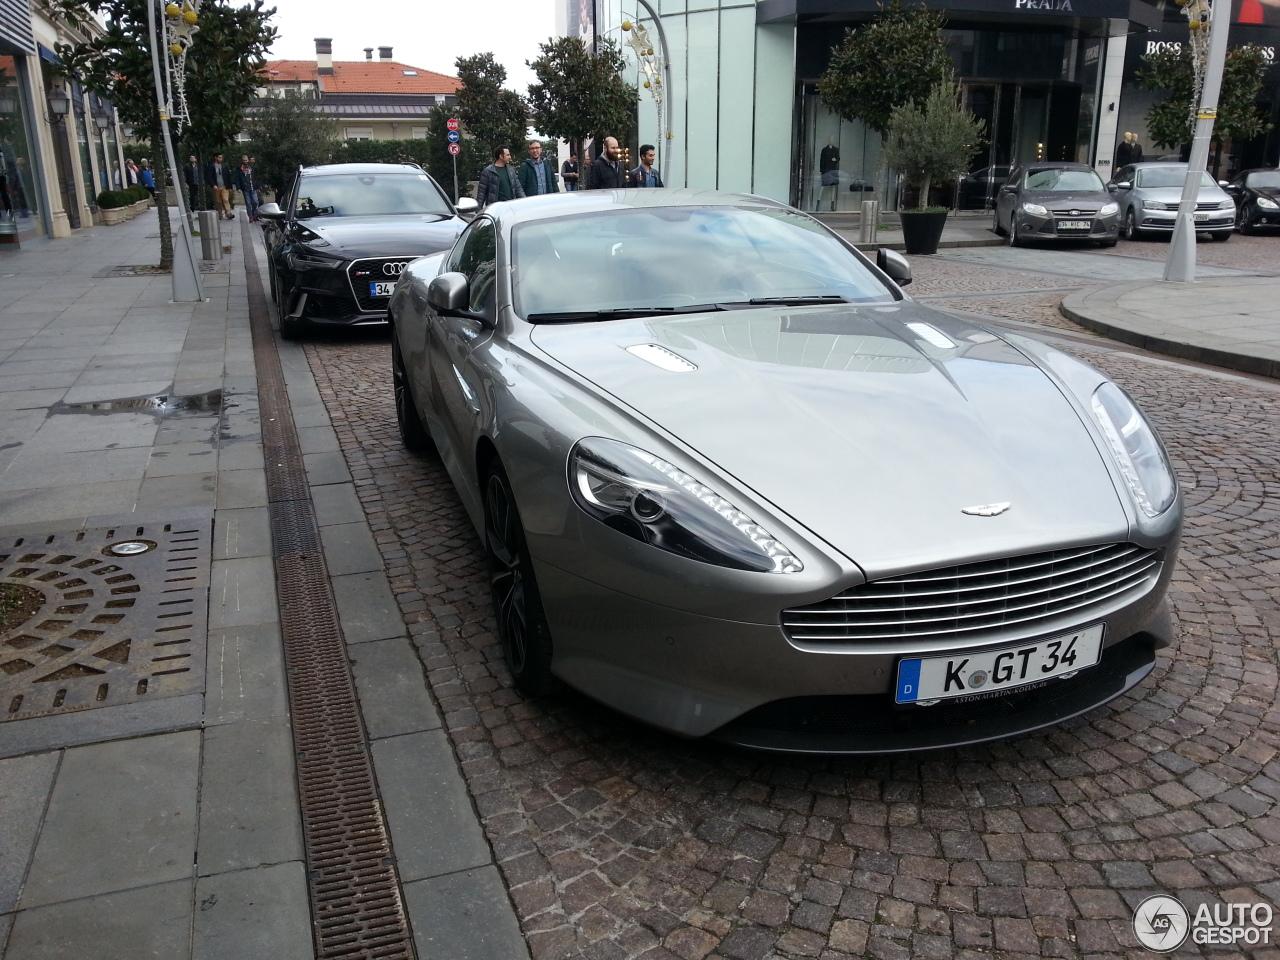 Aston Martin Db9 Gt 2016 Bond Edition 17 Dezember 2015 Autogespot